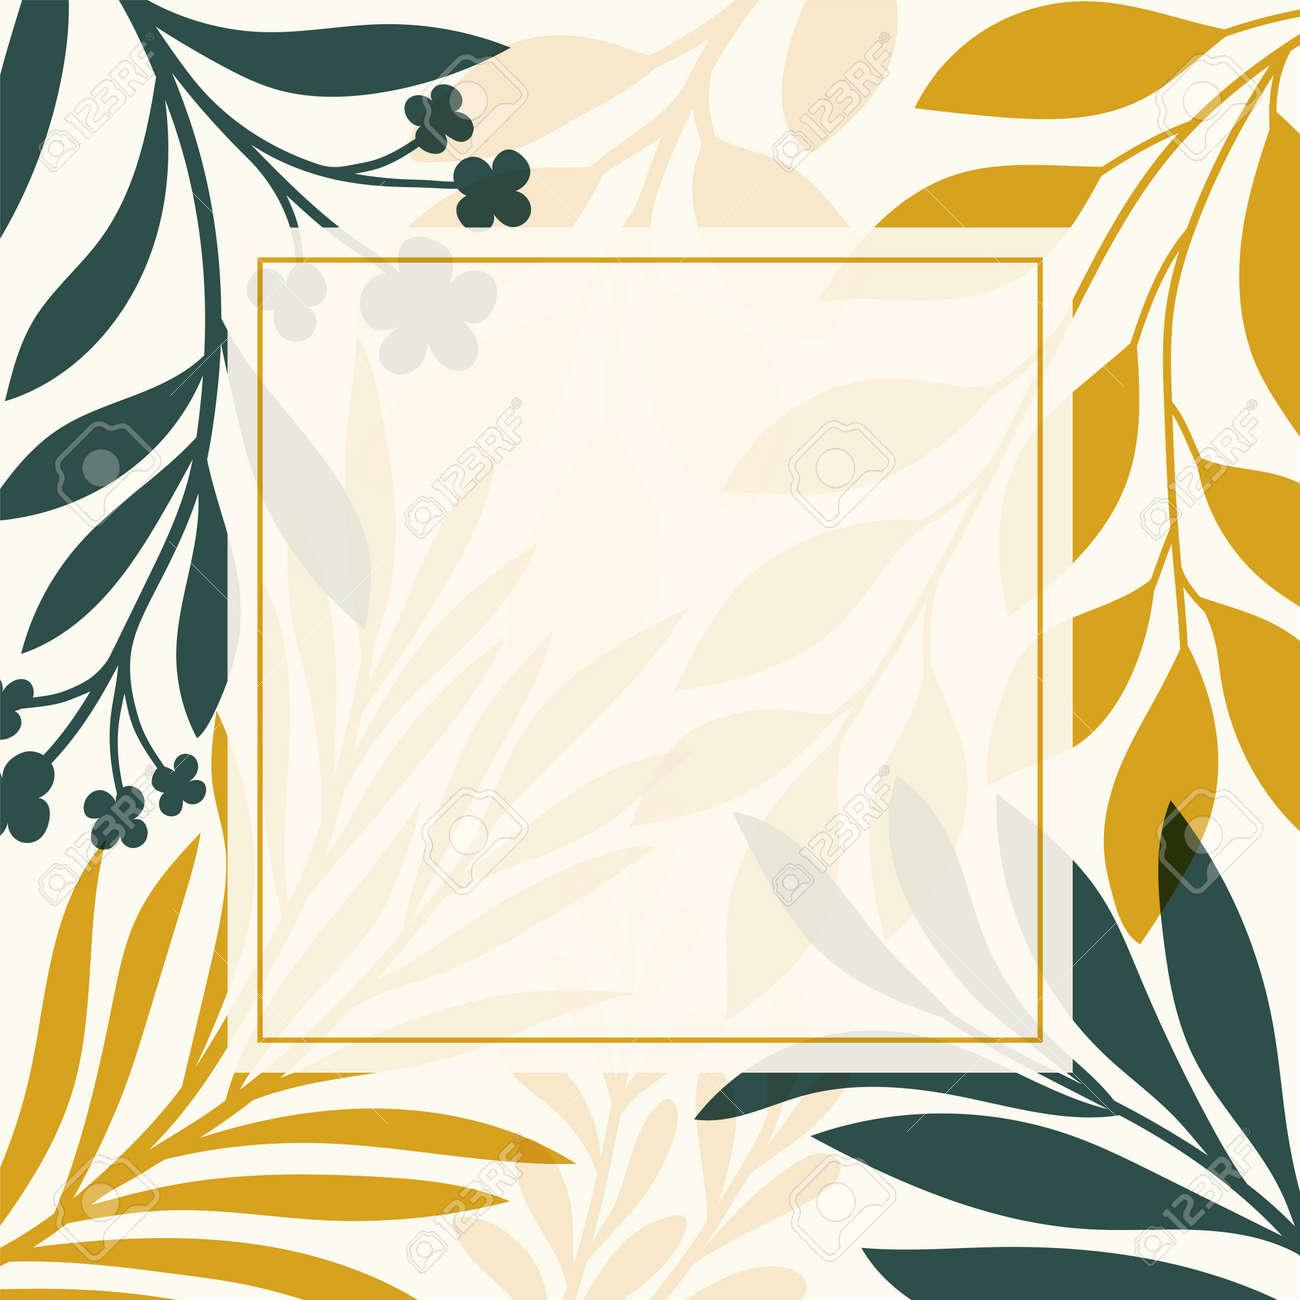 Modern floral vector banner. Botanical illustration template background. Abstract plant elements for print design, social media, post banner and presentation. - 168265312